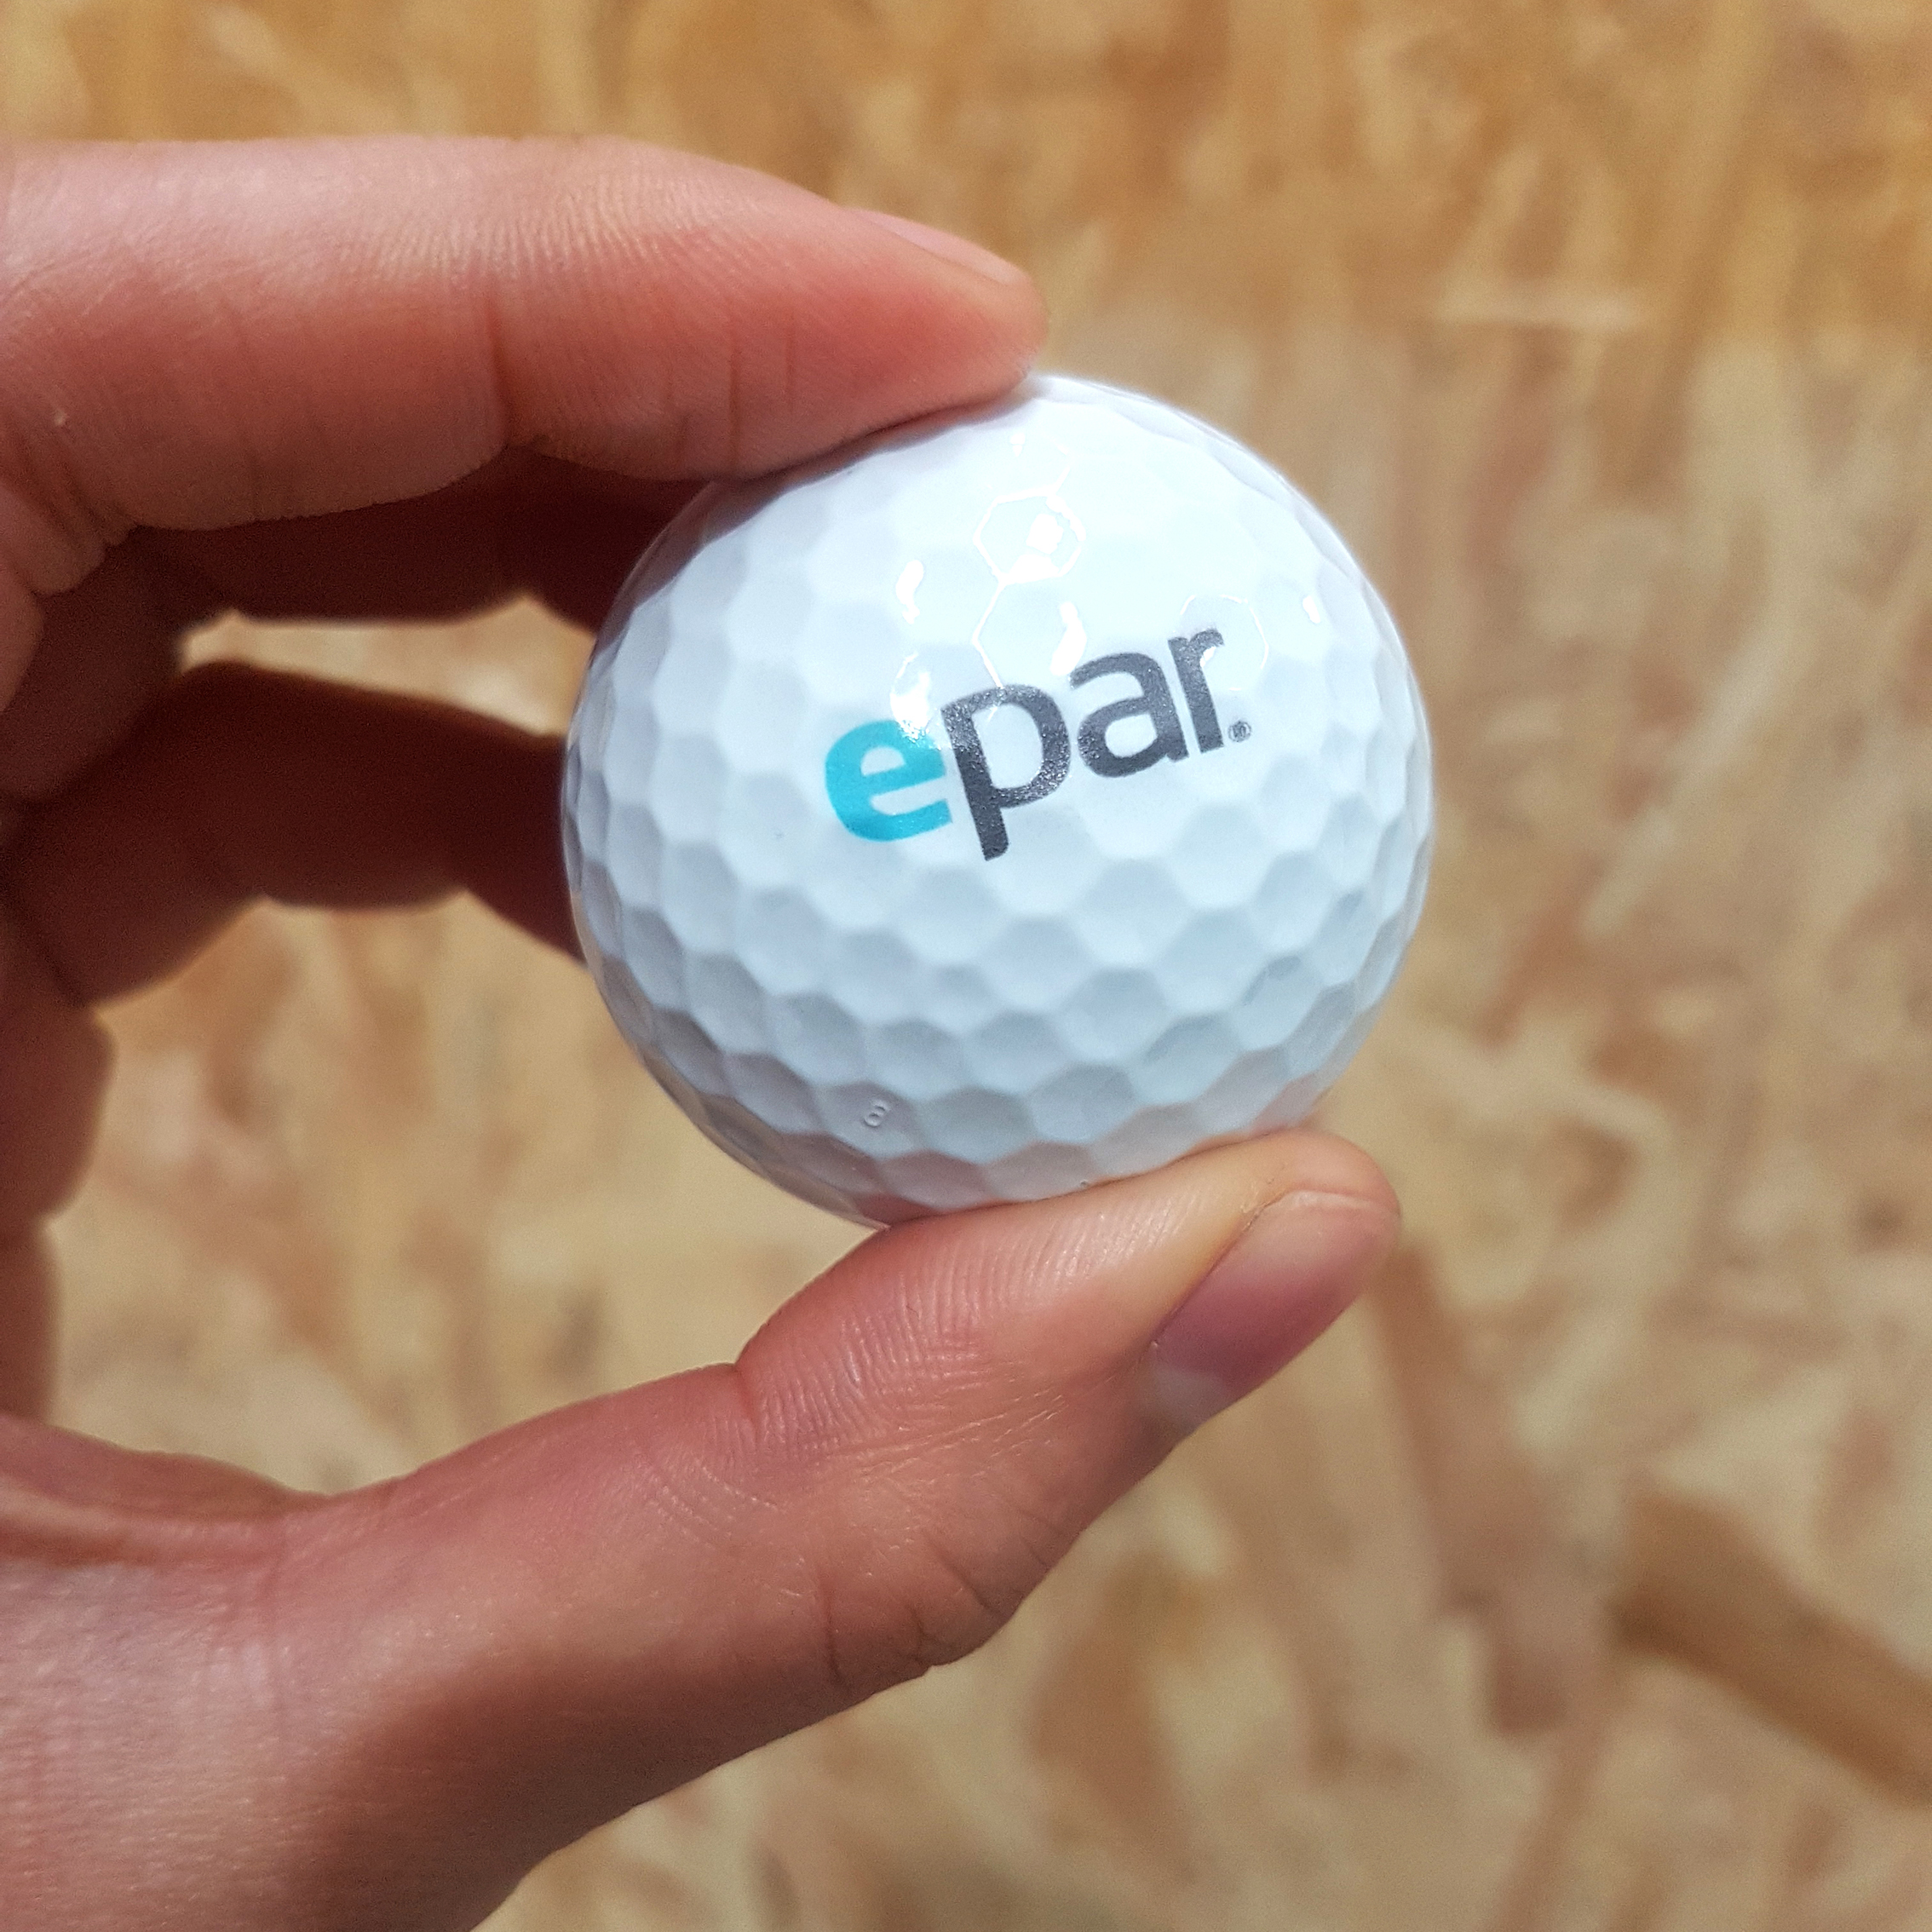 UV Printed Golf Ball - Epar